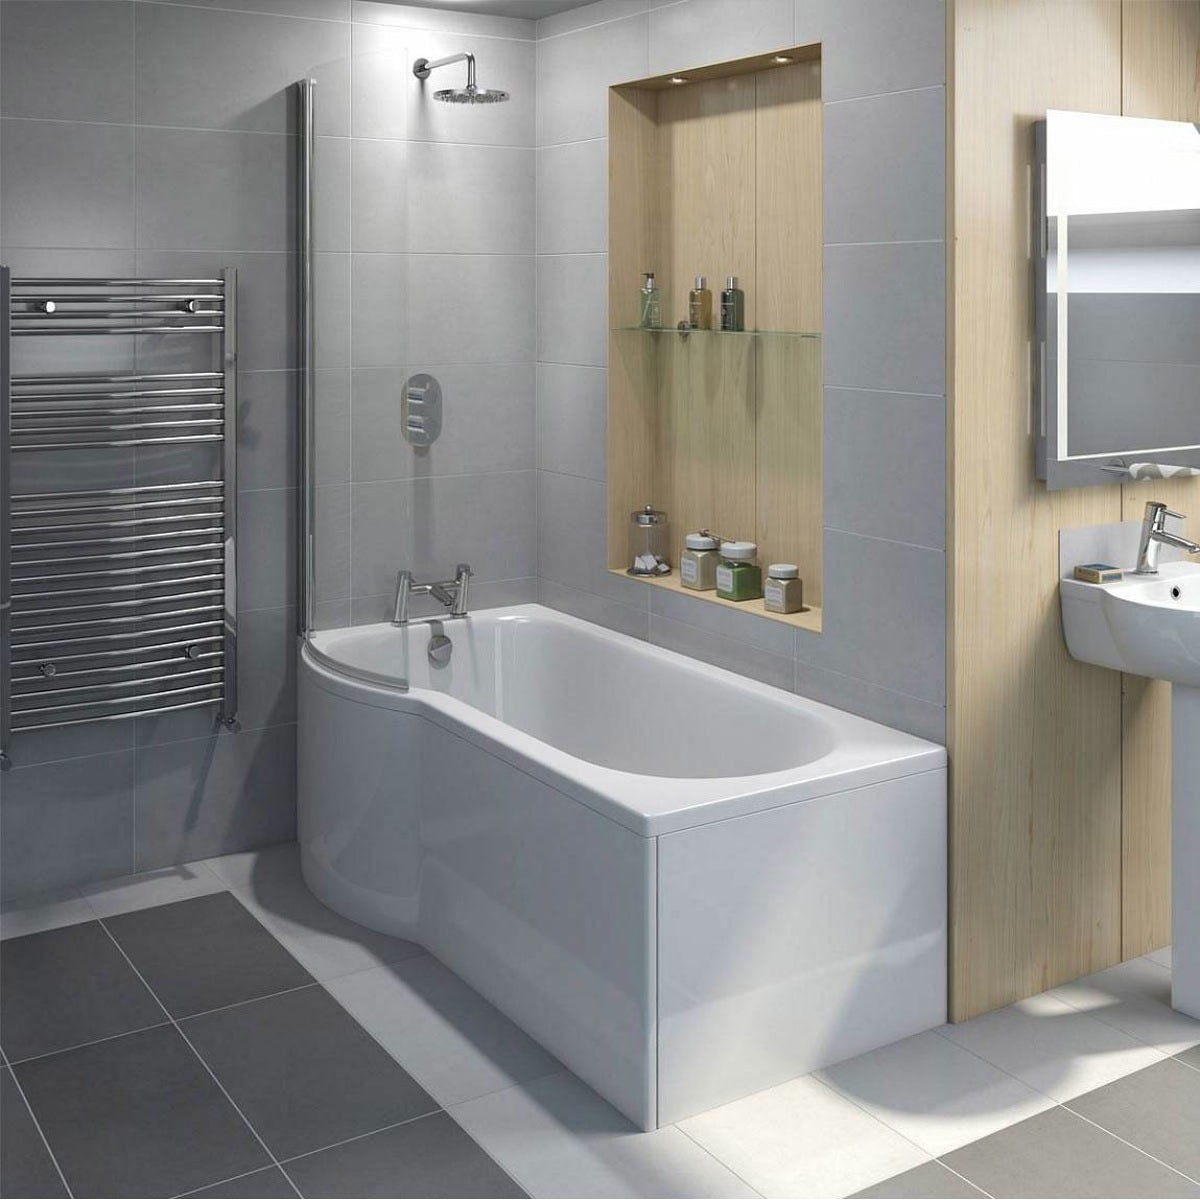 P shaped shower bath